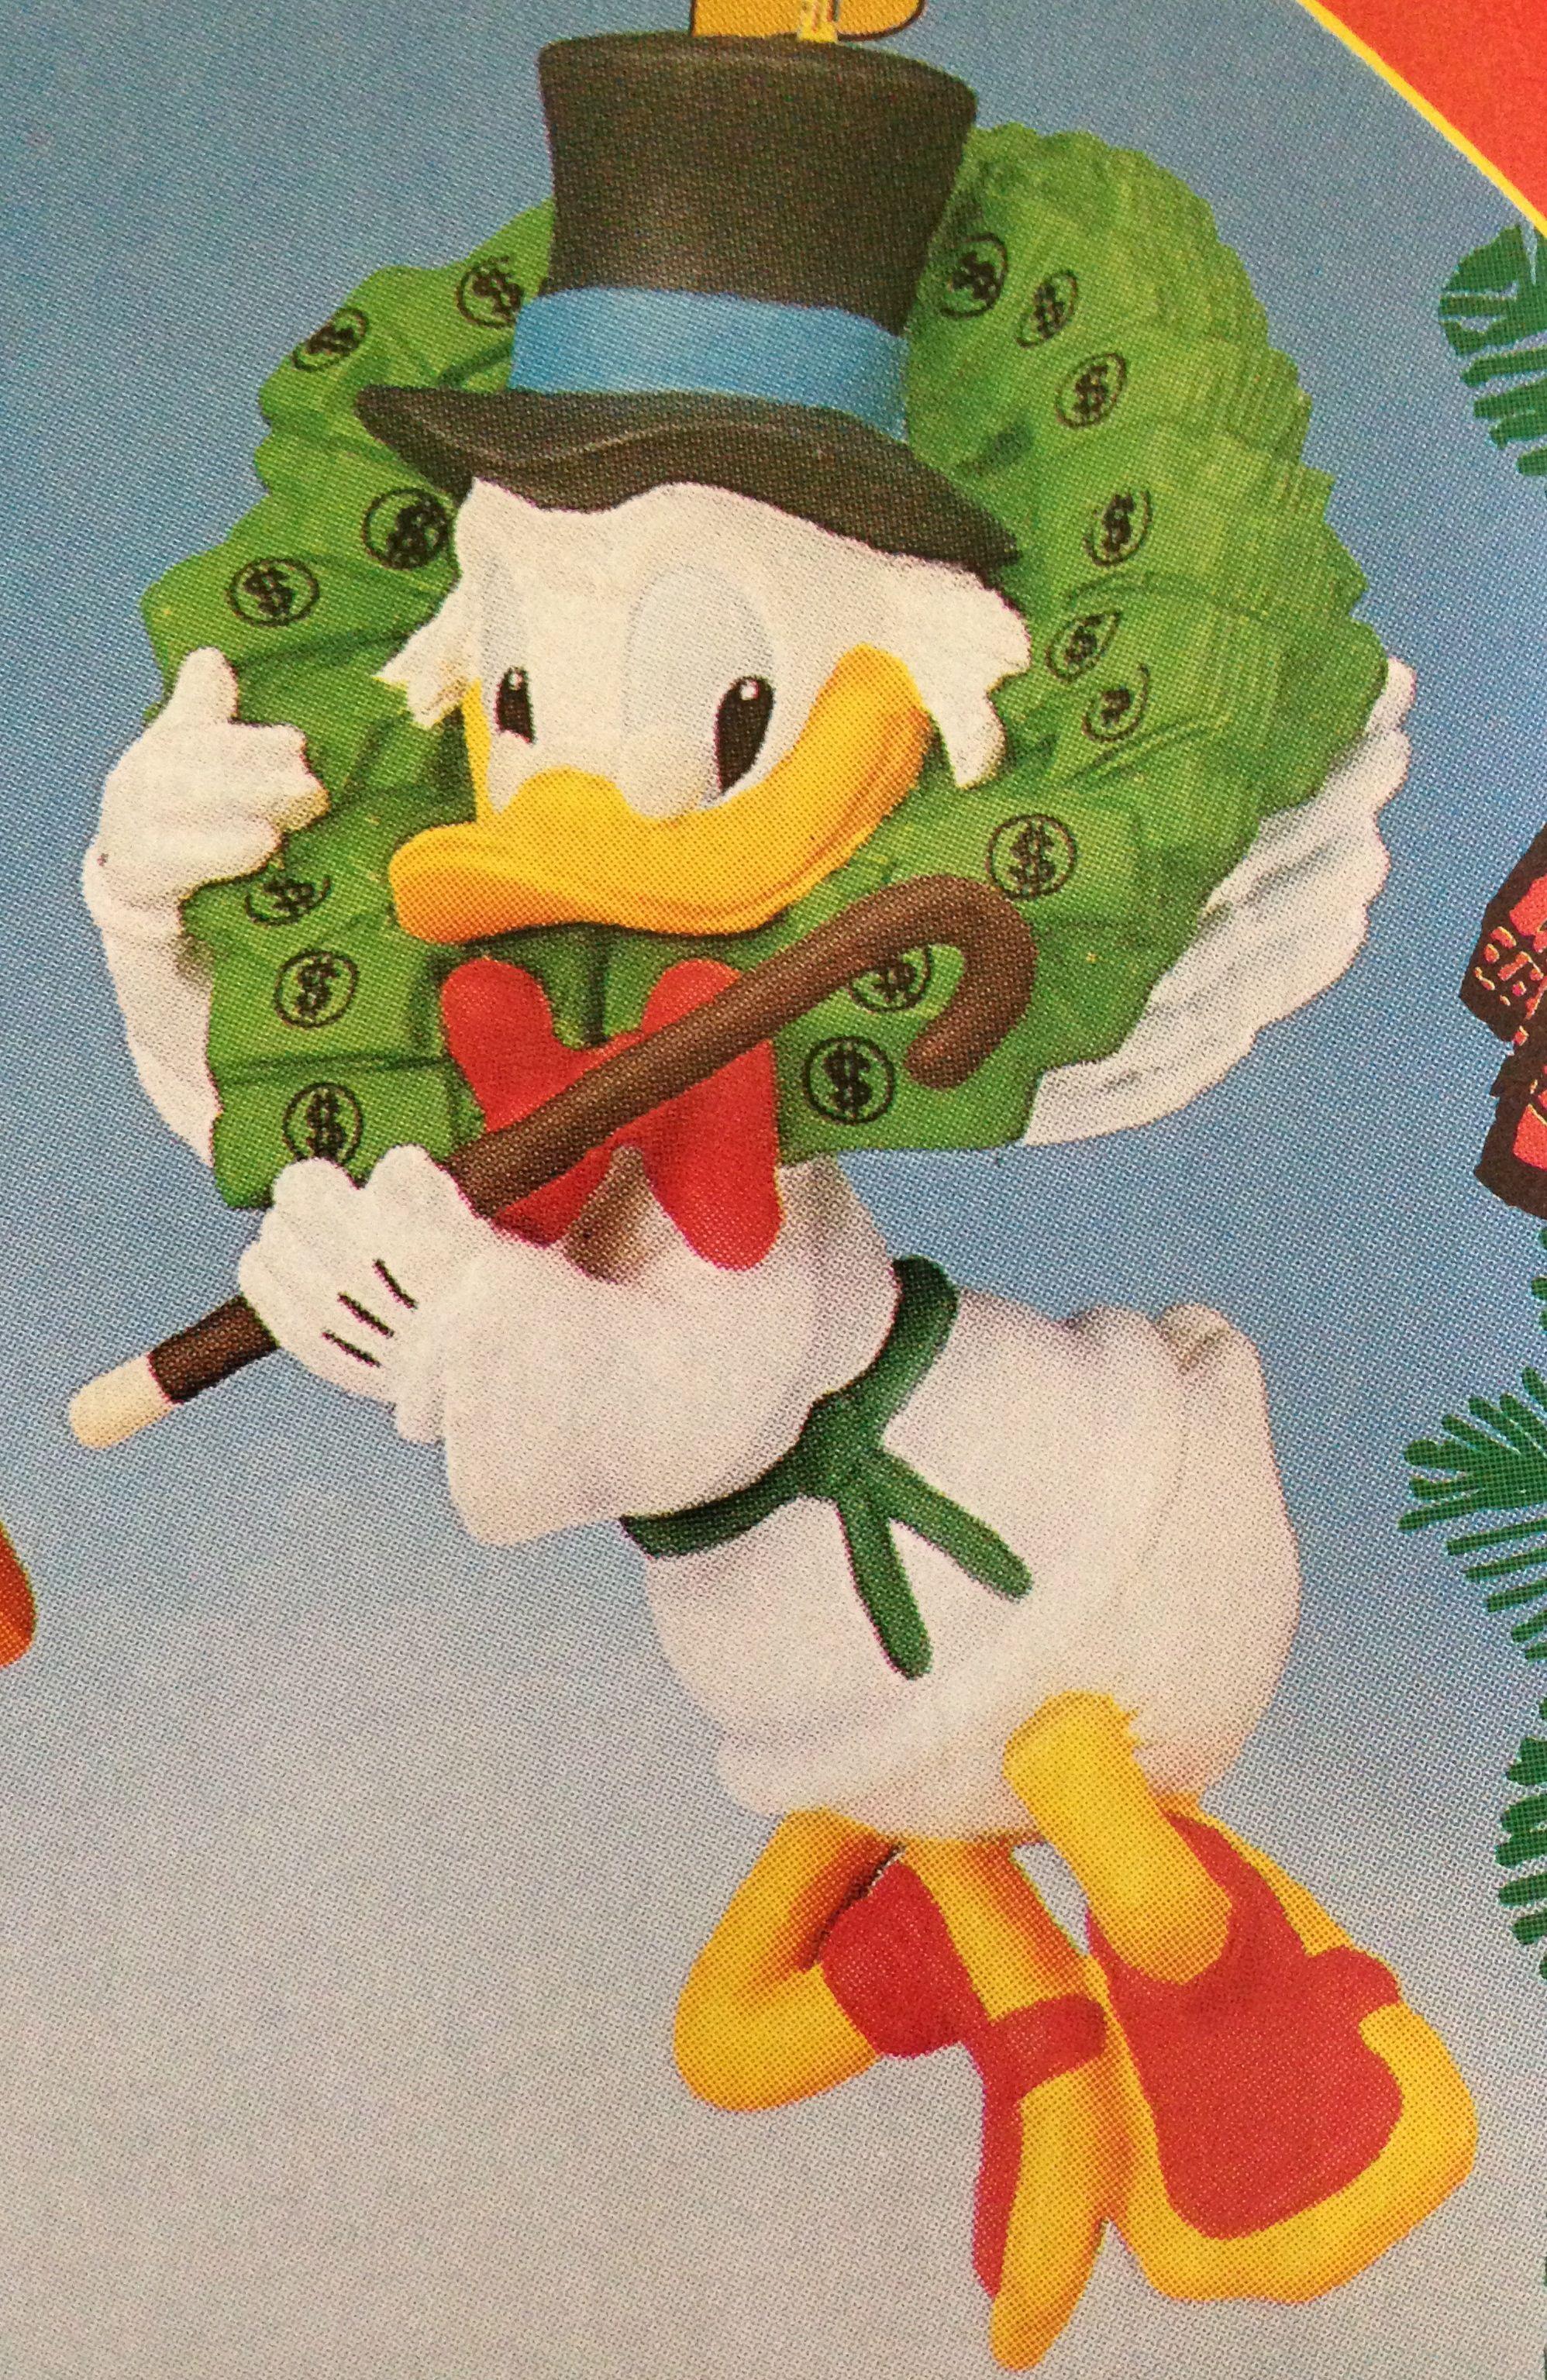 Scrooge Mcduck Angel Christmas Disney Ornament Grolier Disney Christmas Ornaments Disney Ornaments Disney Christmas